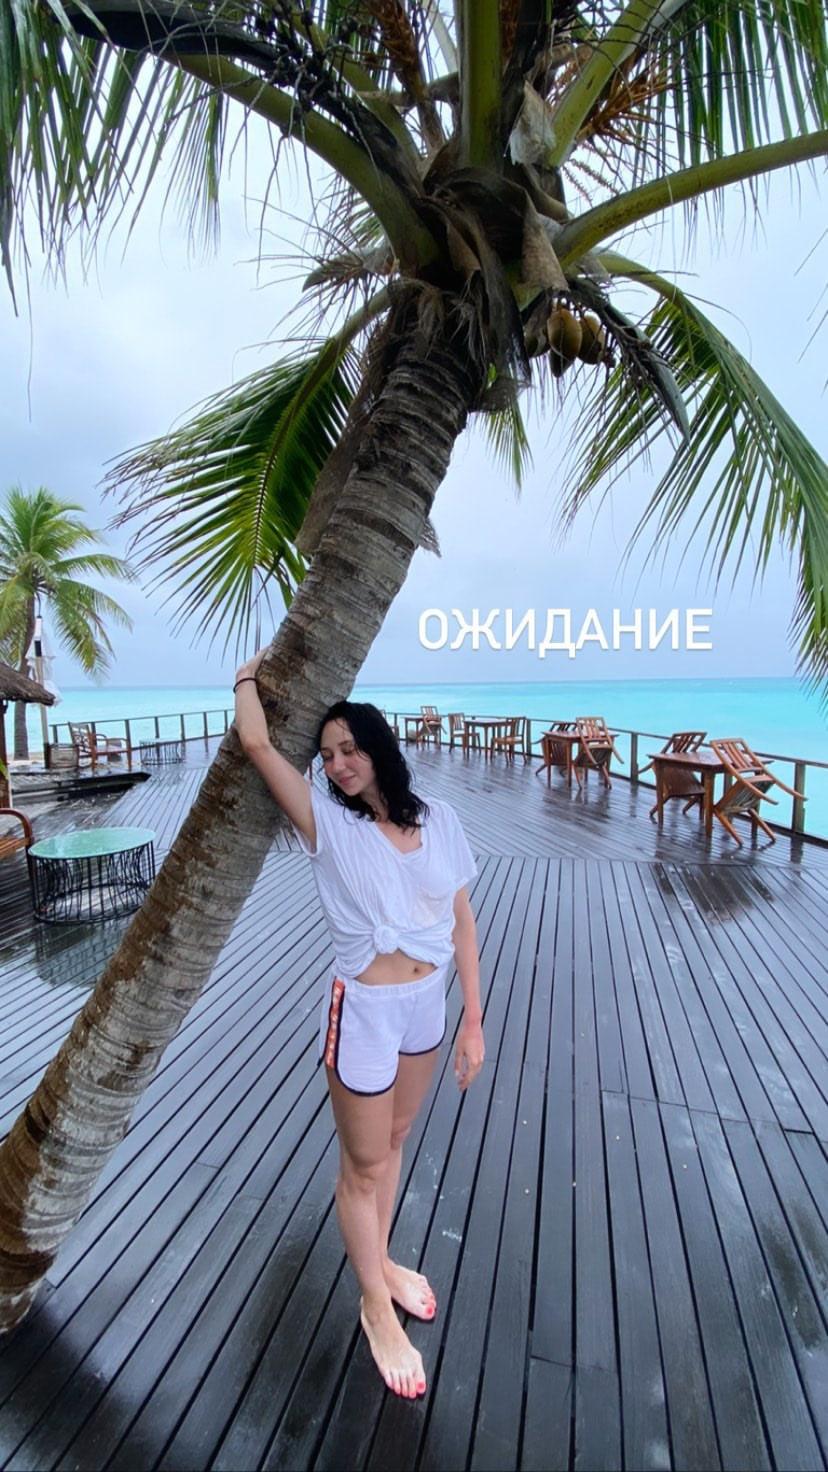 https://i5.imageban.ru/out/2021/05/12/ece9b2f55677710ff8752810736e42fd.jpg